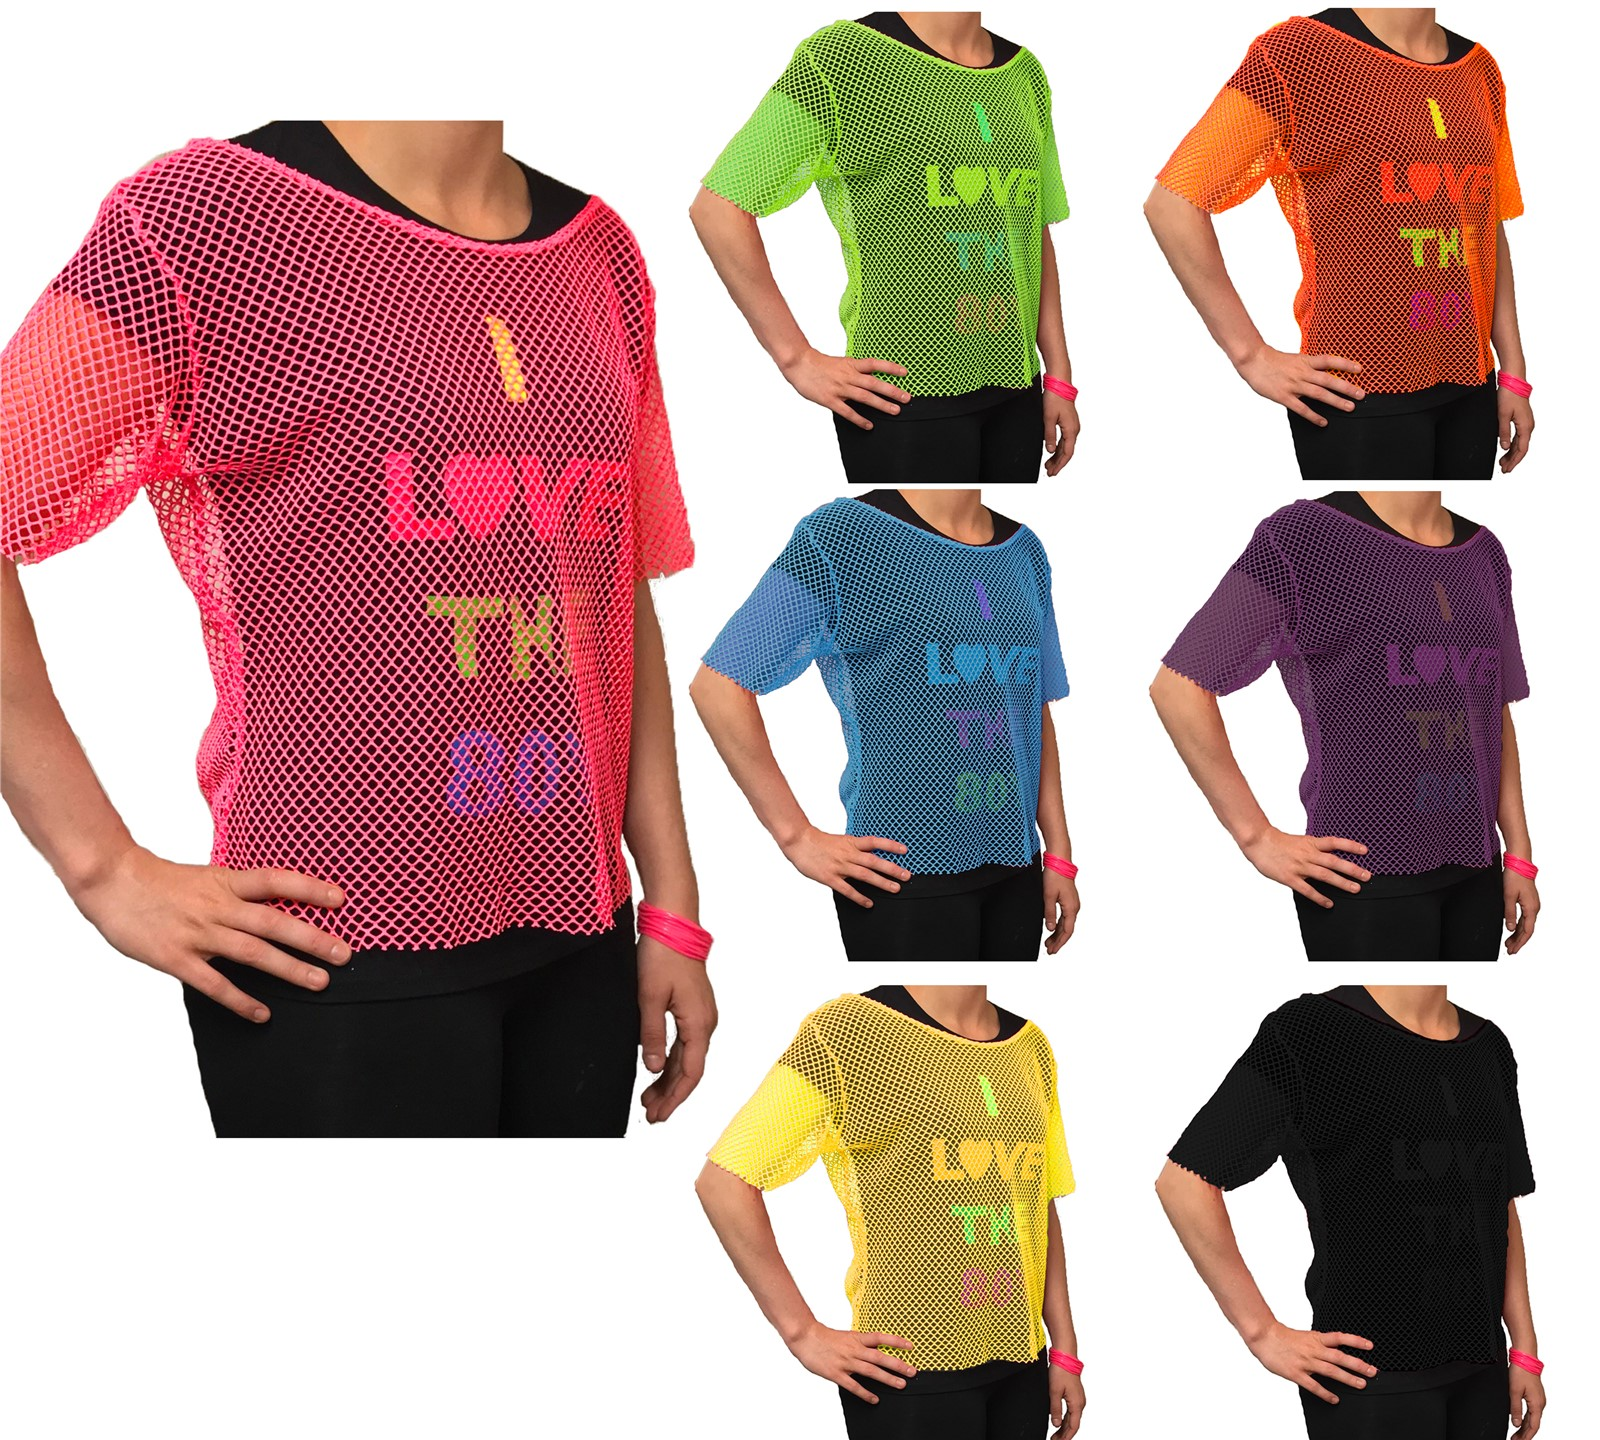 Neon Mesh Top femmes robe fantaisie 80 S Neon Mesh Top